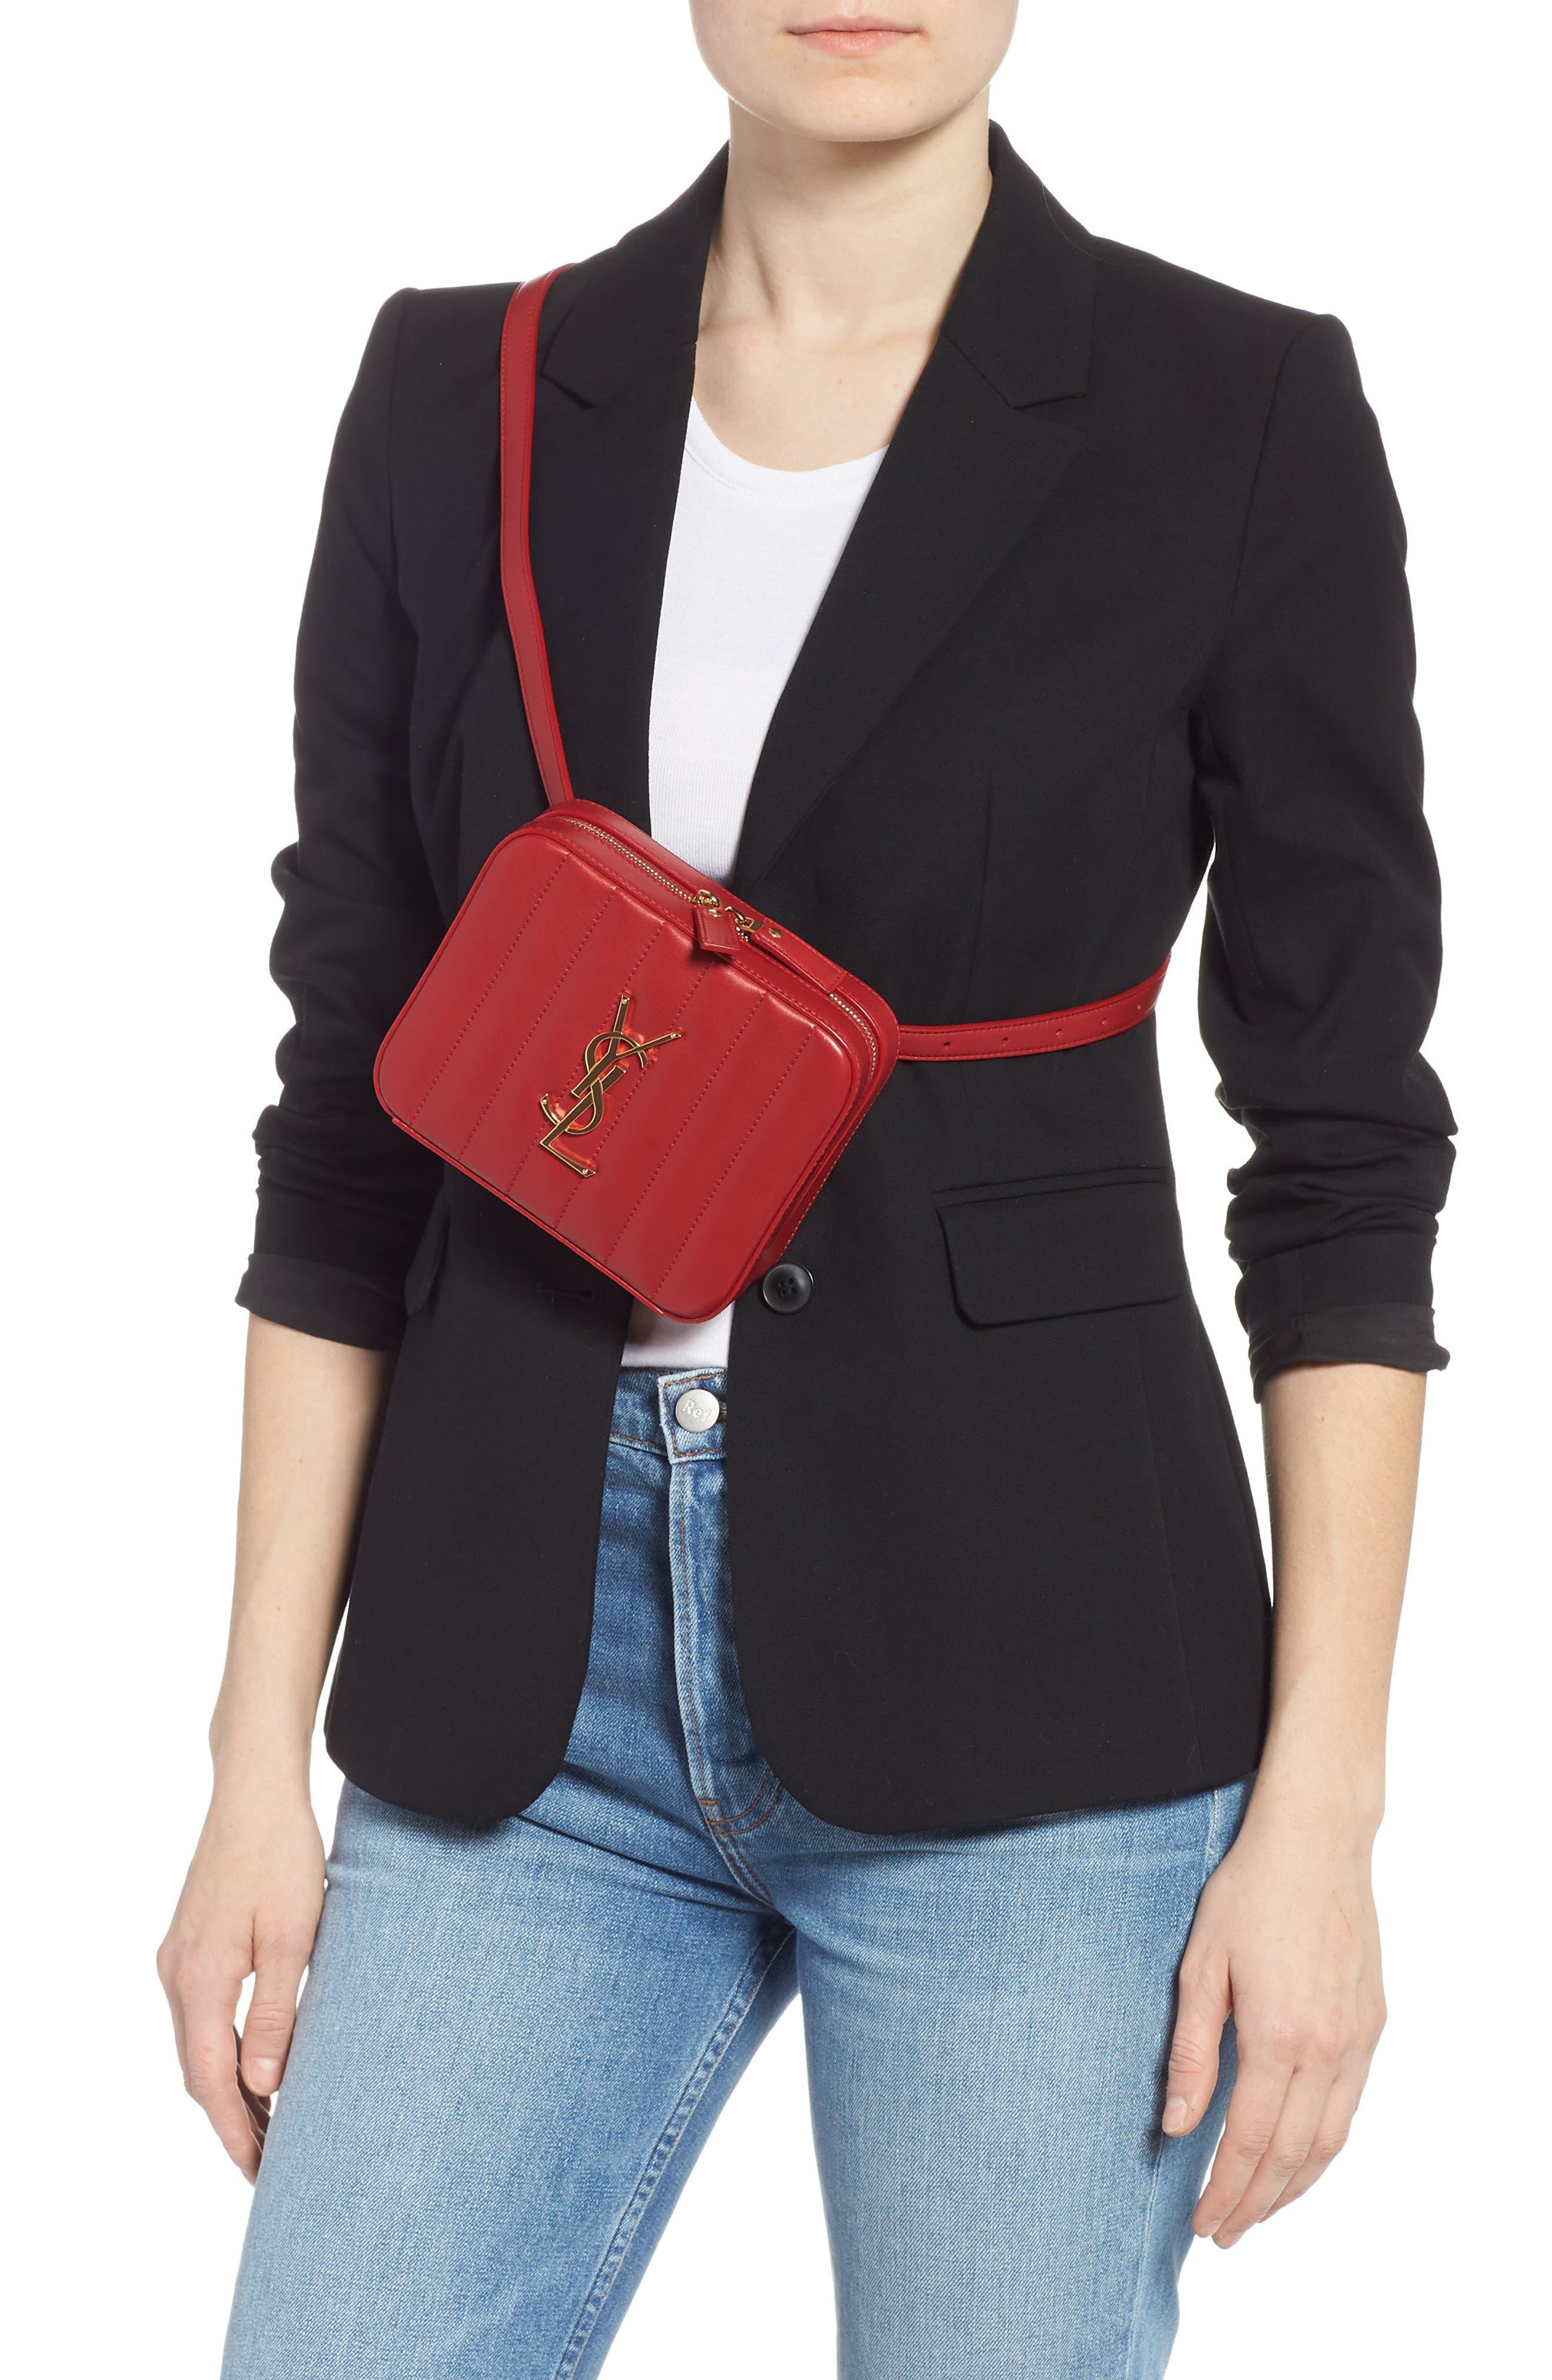 SAINT LAURENT, Vicky Lambskin Leather Belt Bag, Alternate thumbnail 3, color, ROUGE EROS